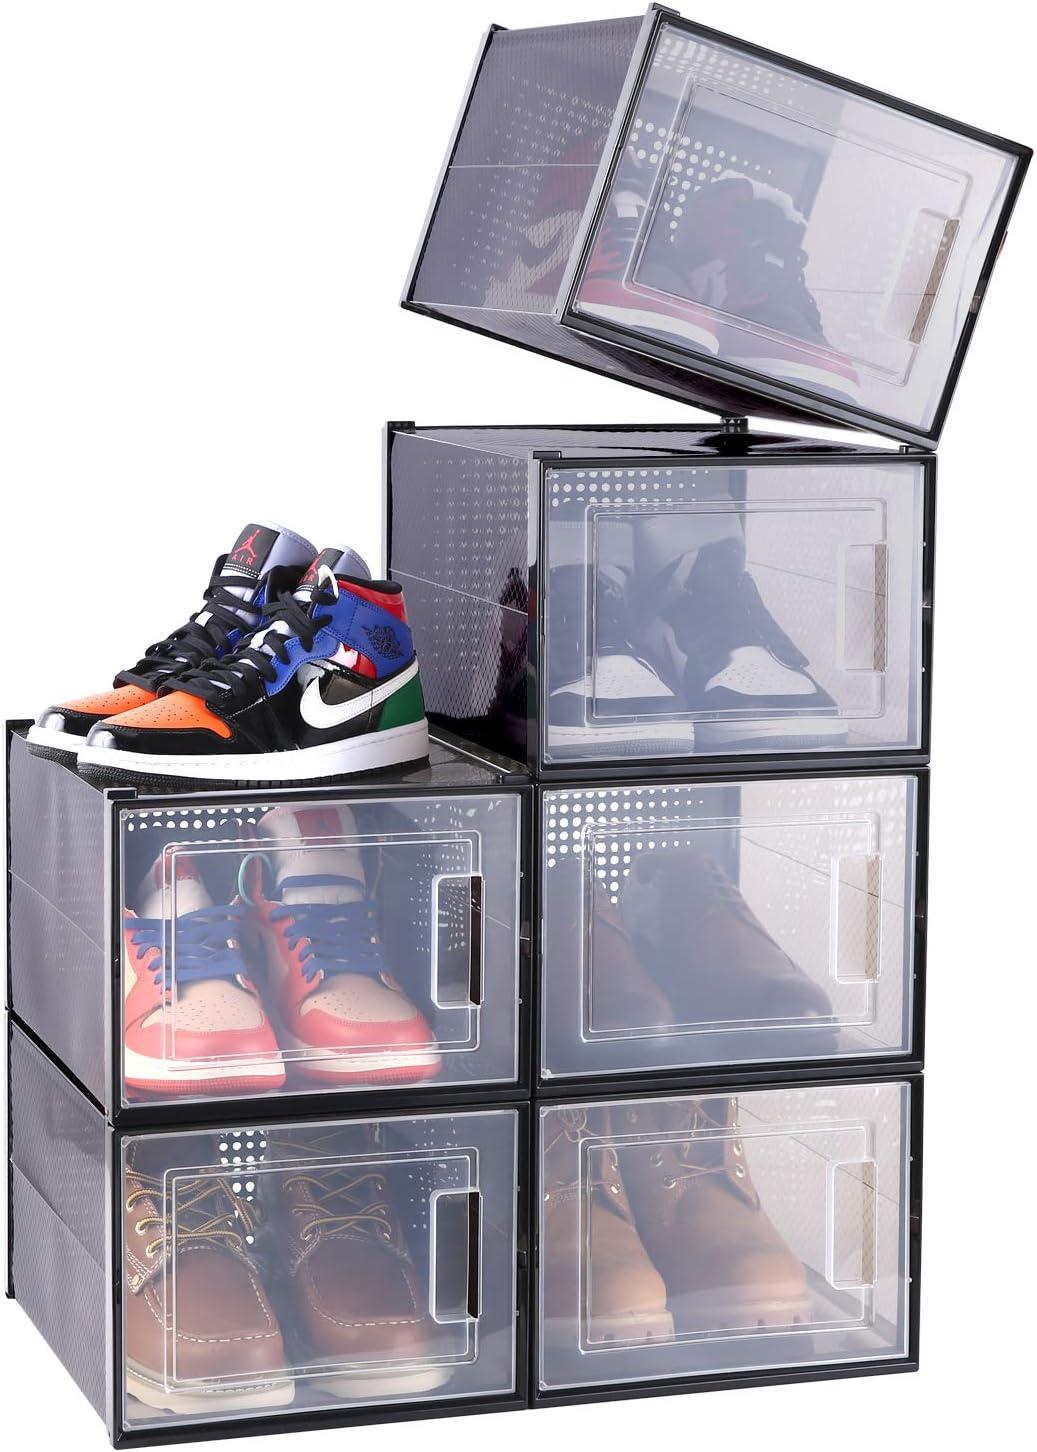 Shoe Organizer Ohuhu Ultra Large Storage Ranking TOP11 6 Minneapolis Mall Duty Pac Heavy